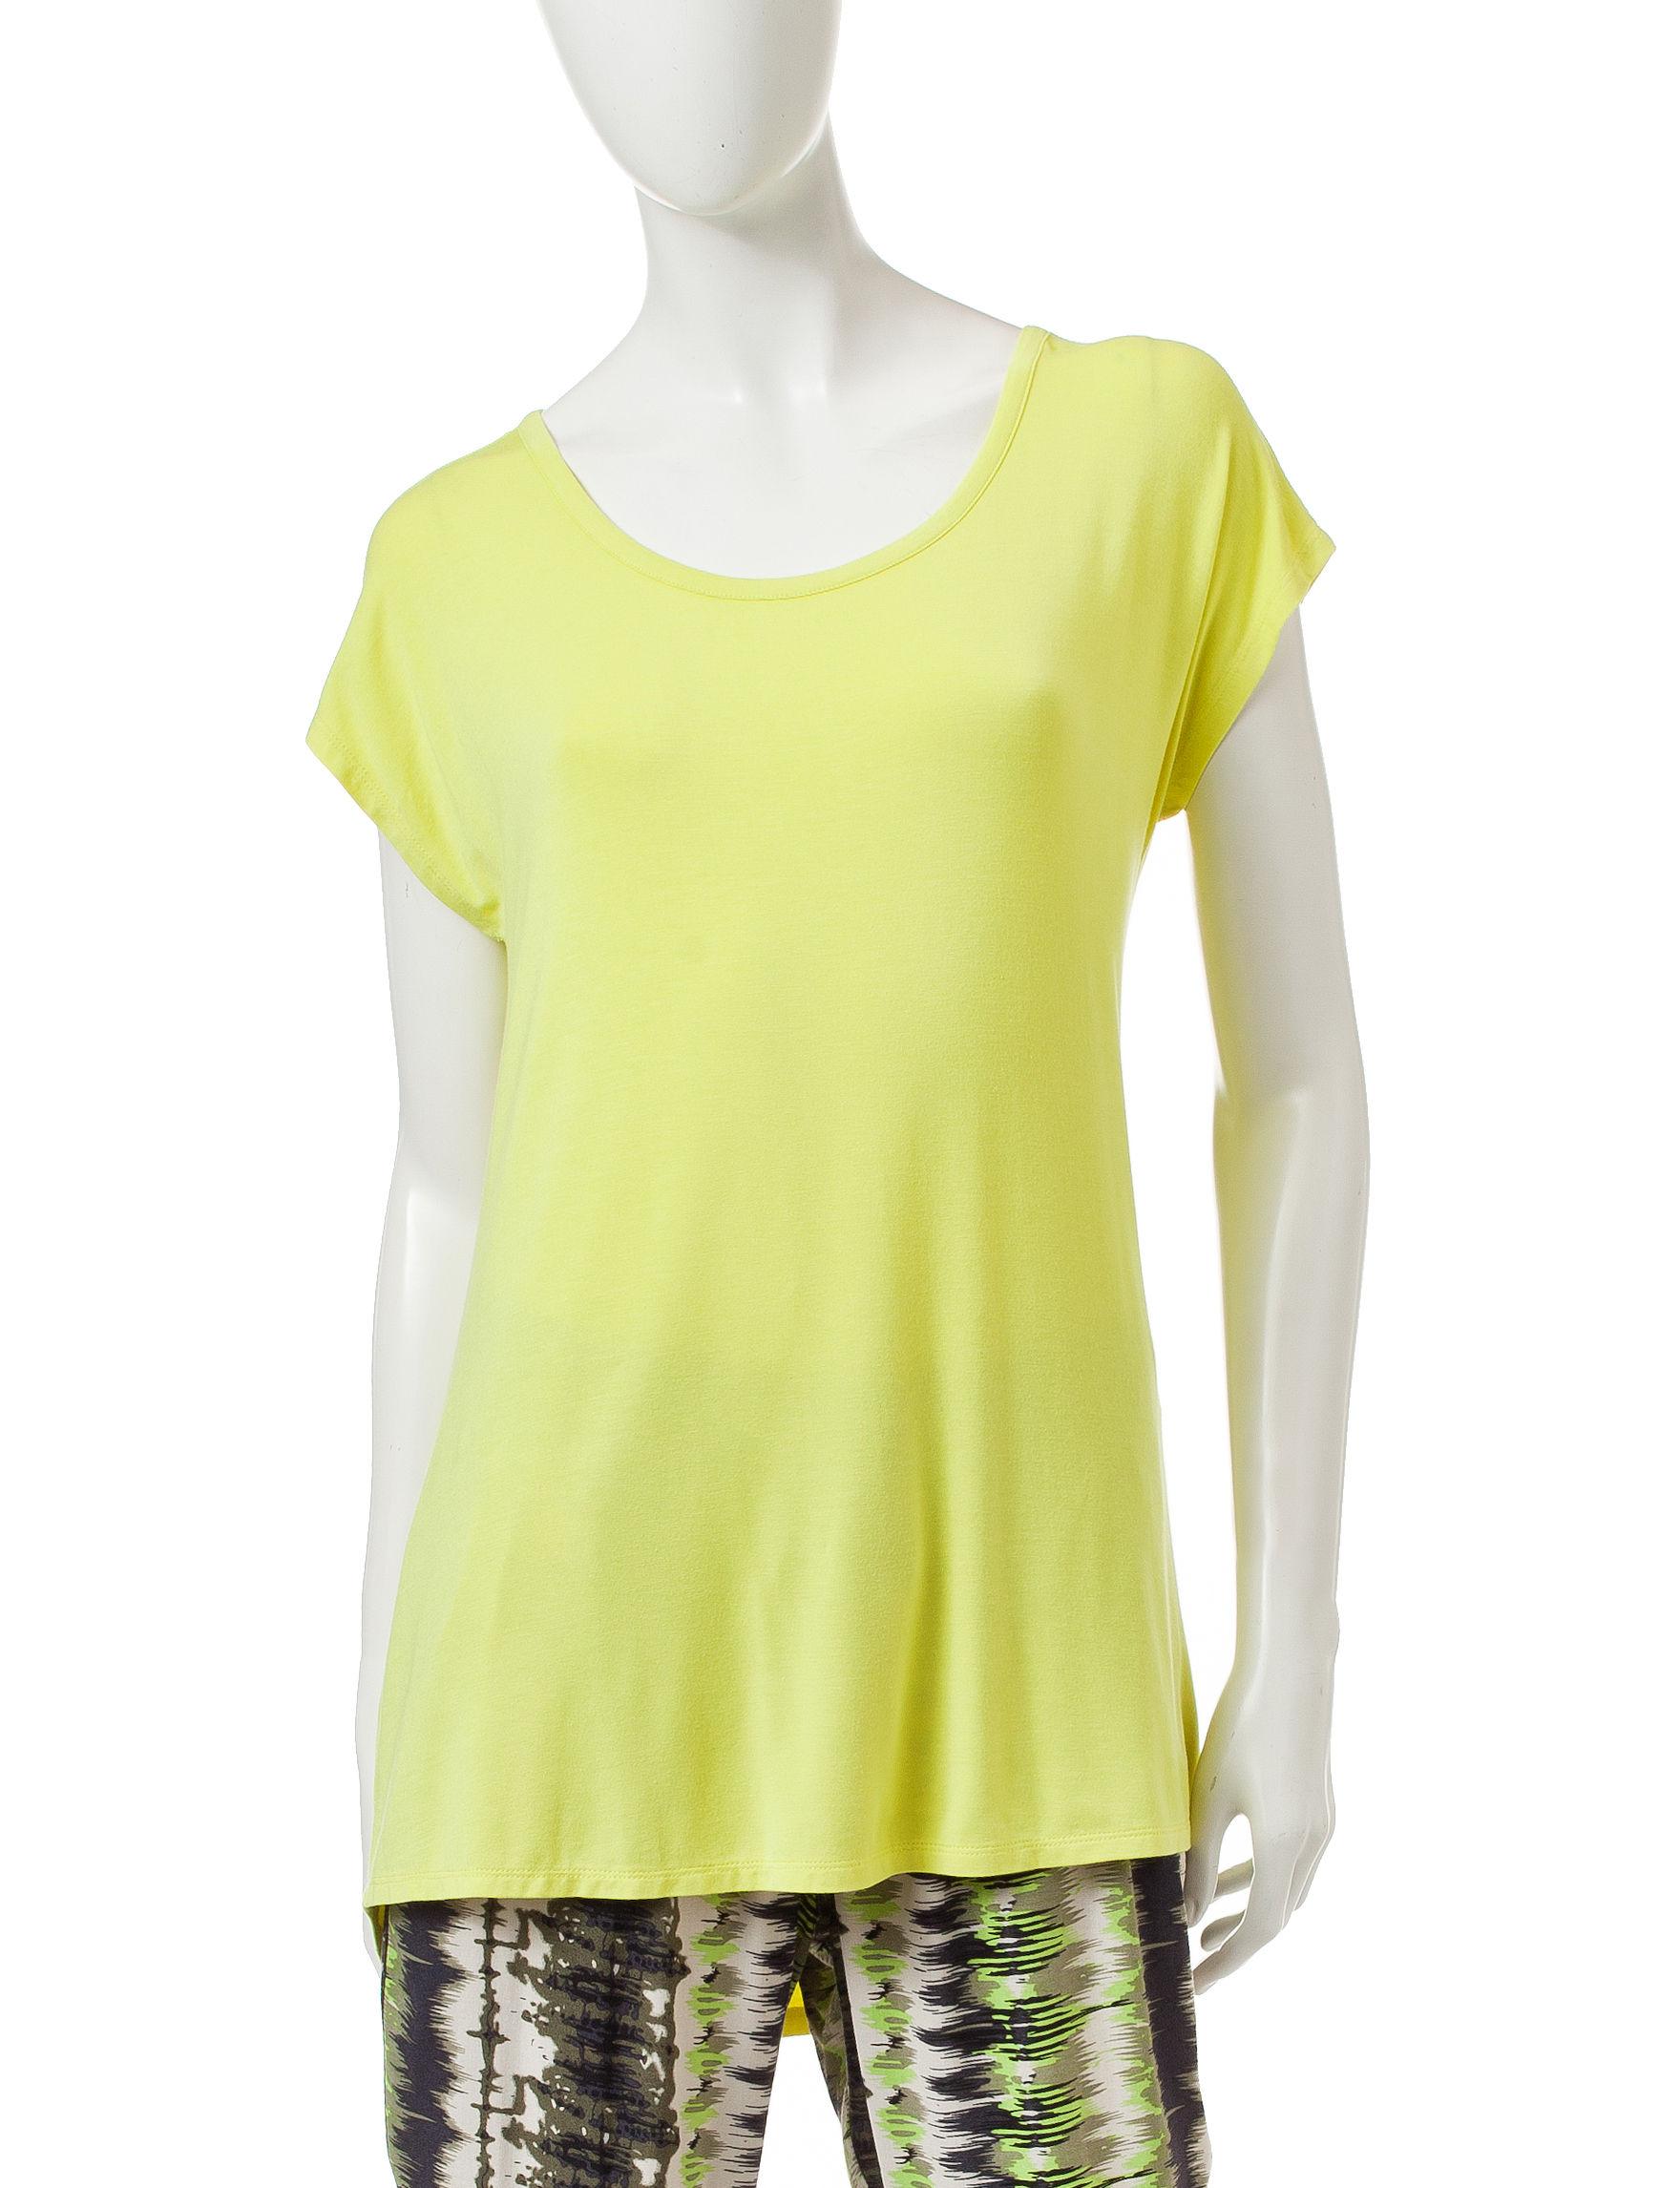 Signature Studio Lime Shirts & Blouses